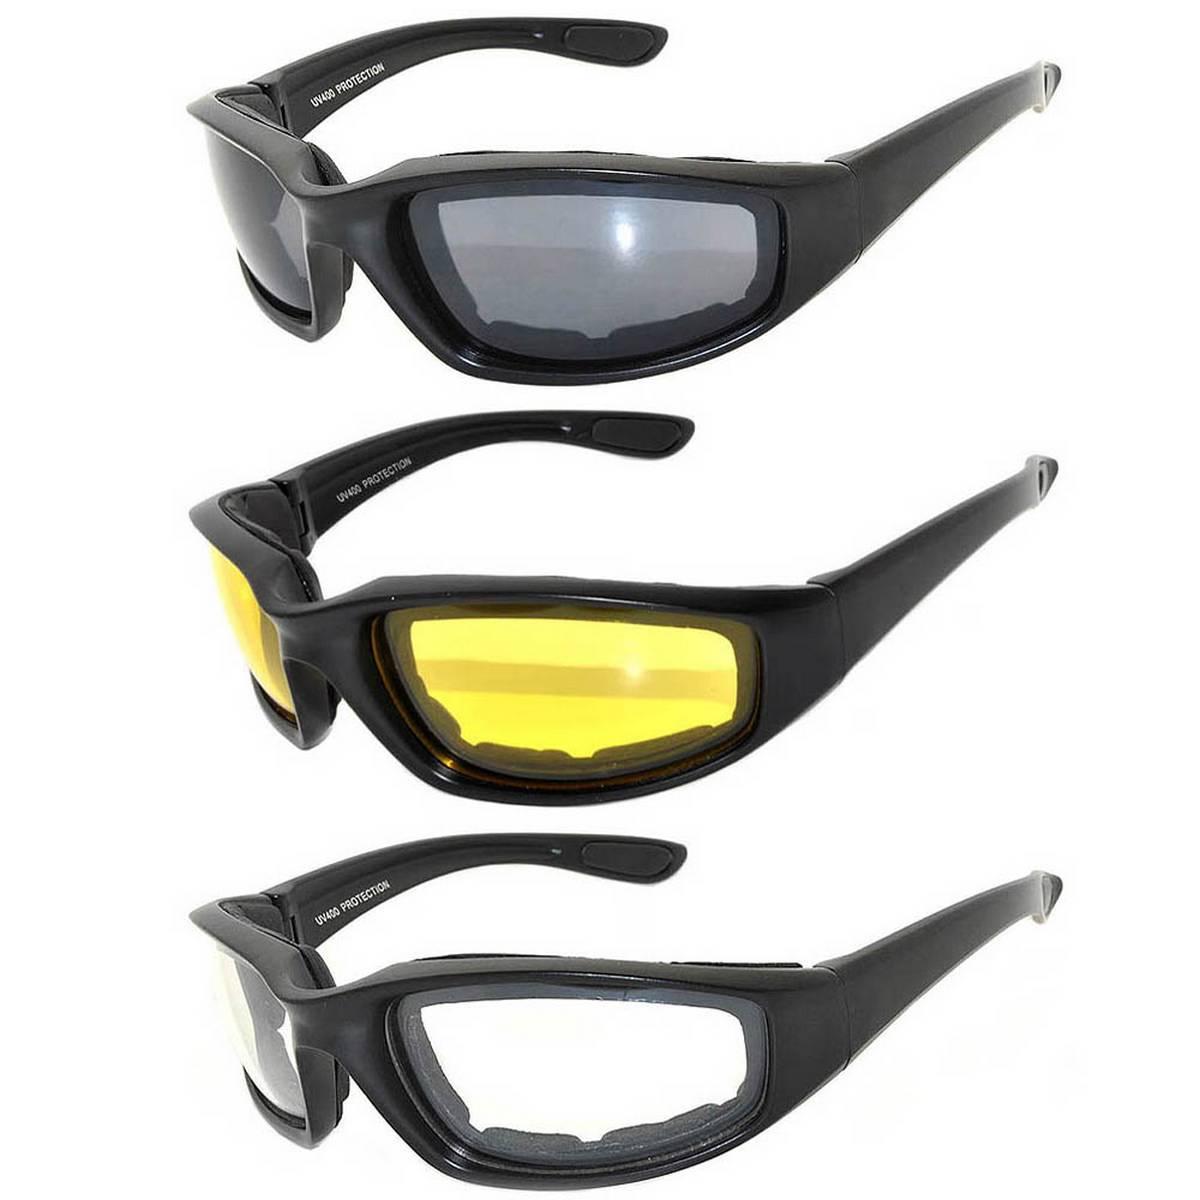 Day Night Vision Polarizing glasses Bike, Car Drivers Anti Glare Polarized Night Driving Unisex Sunglasses Goggles Auto Accessories